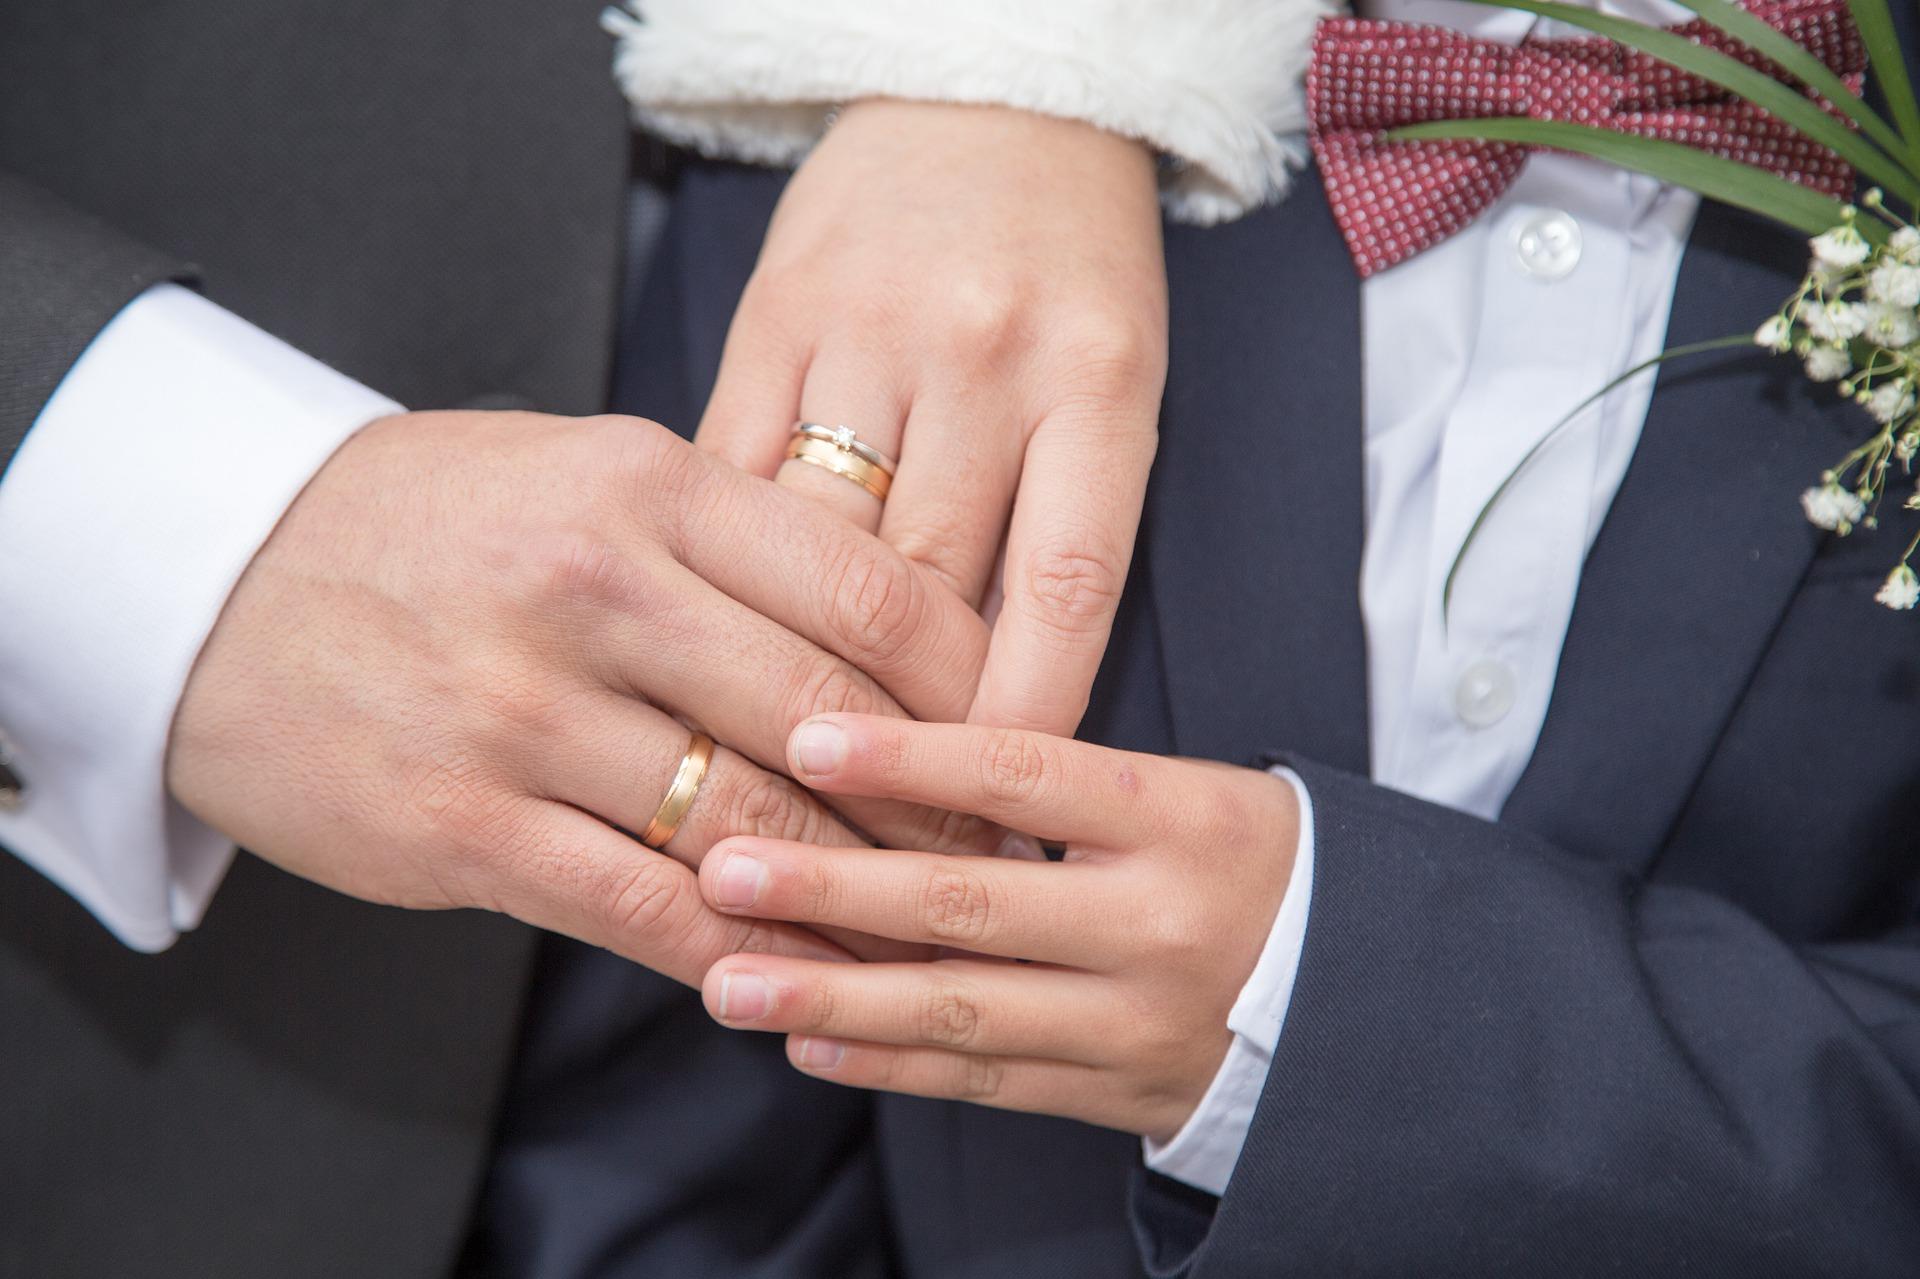 wedding-4559849_1920